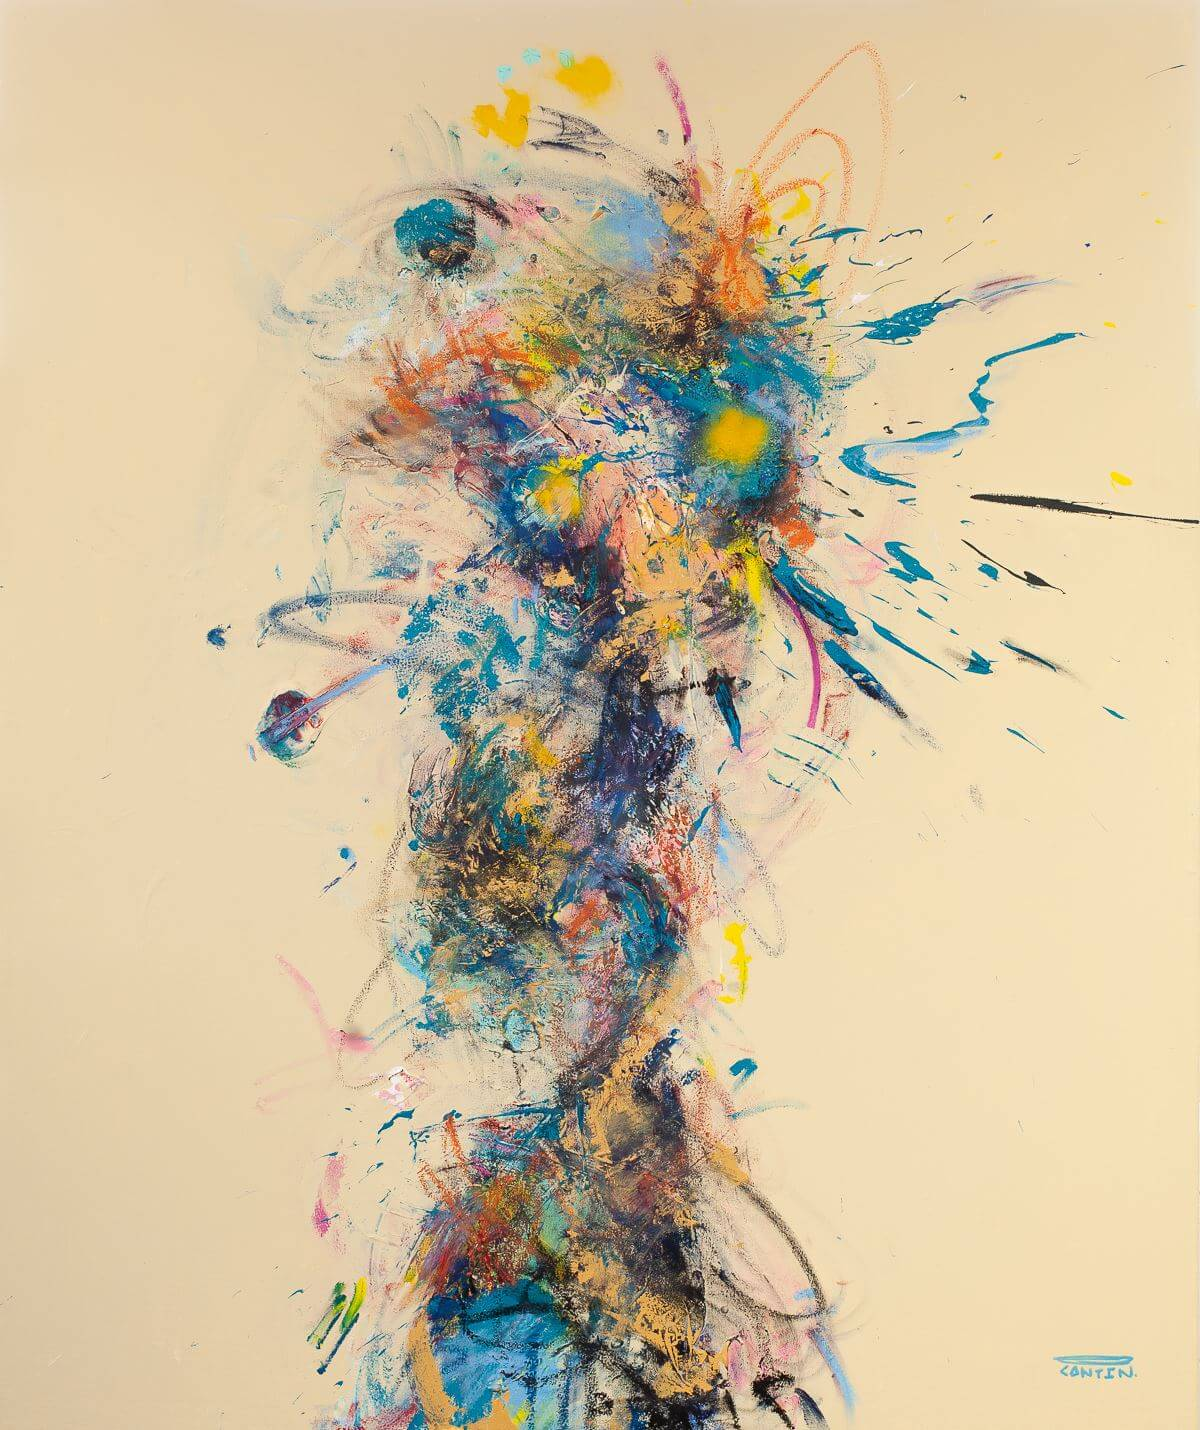 Pat Cantin Artiste Peintre / Paperboy